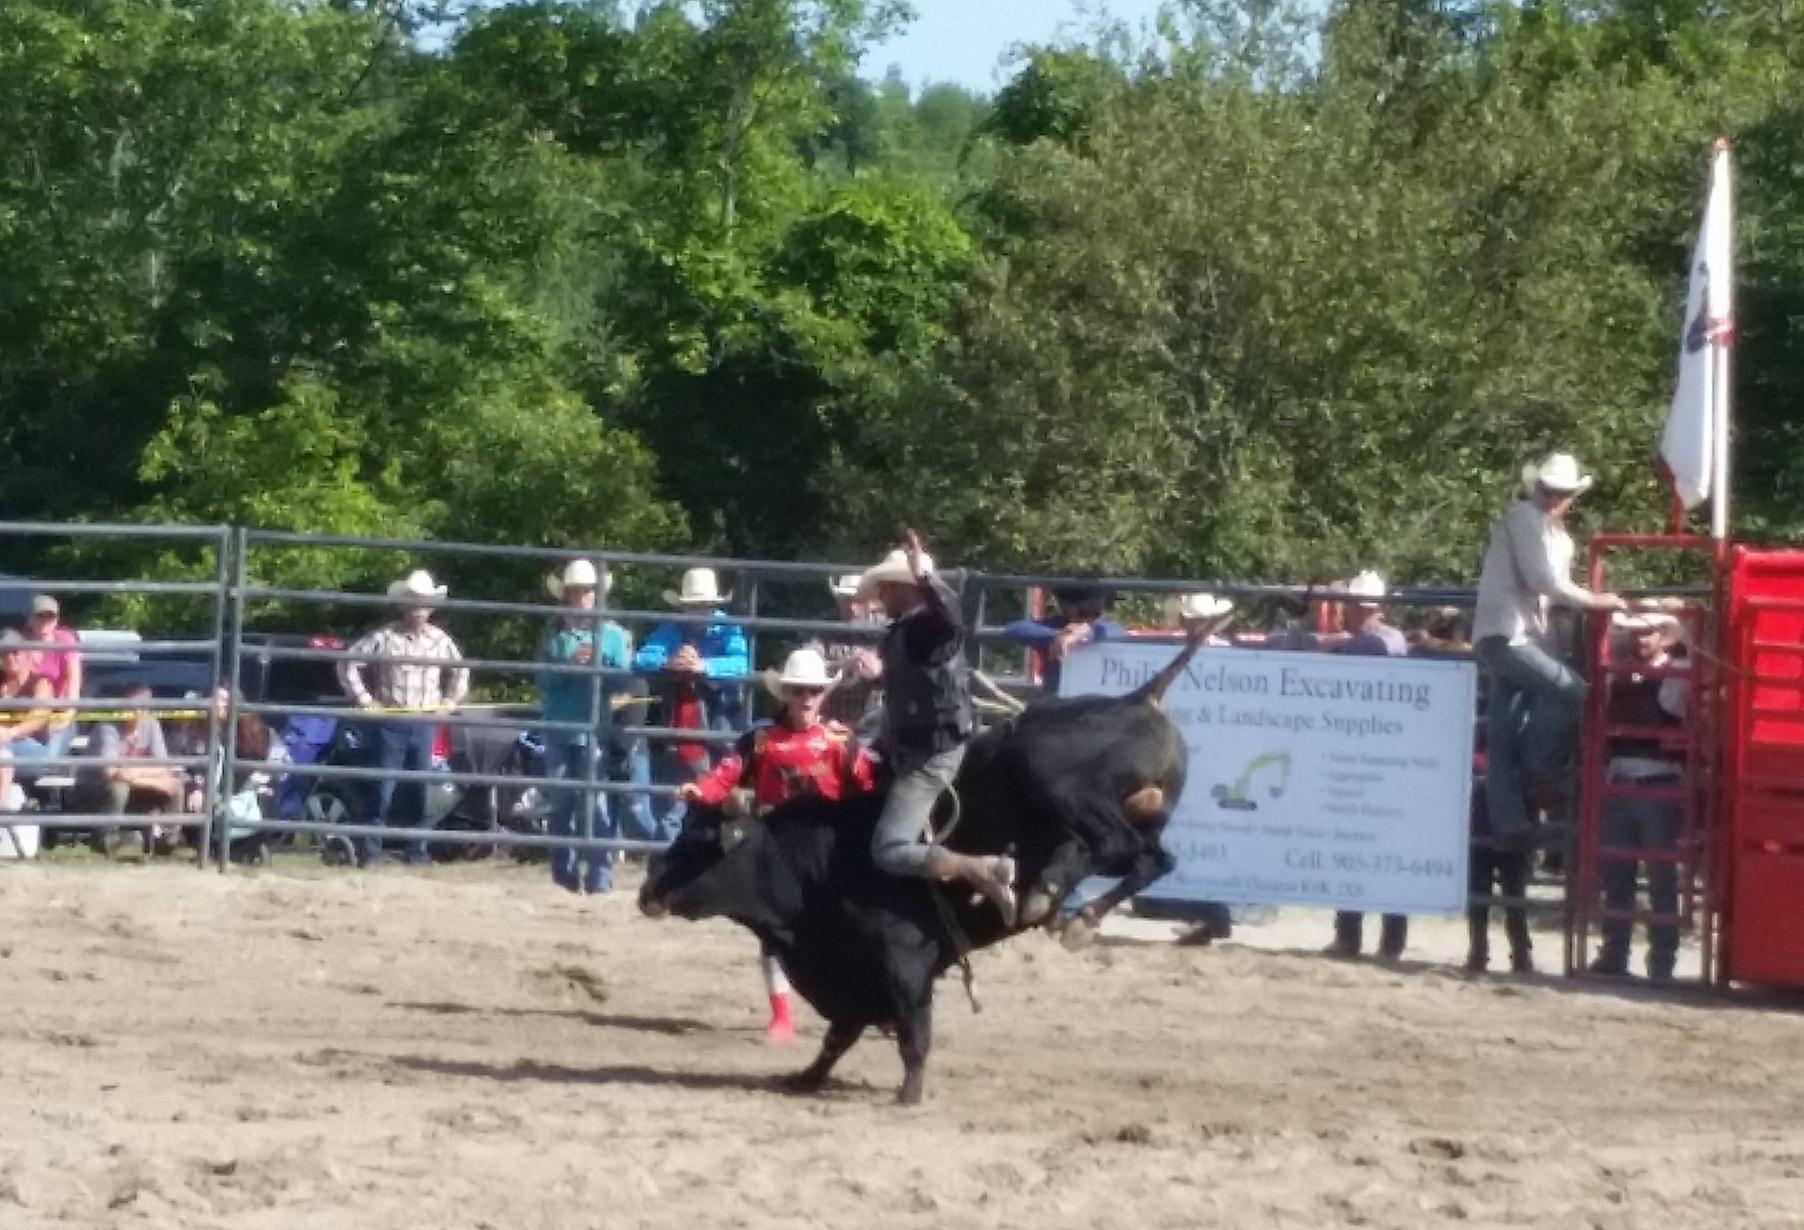 Bull riding. The bull won.